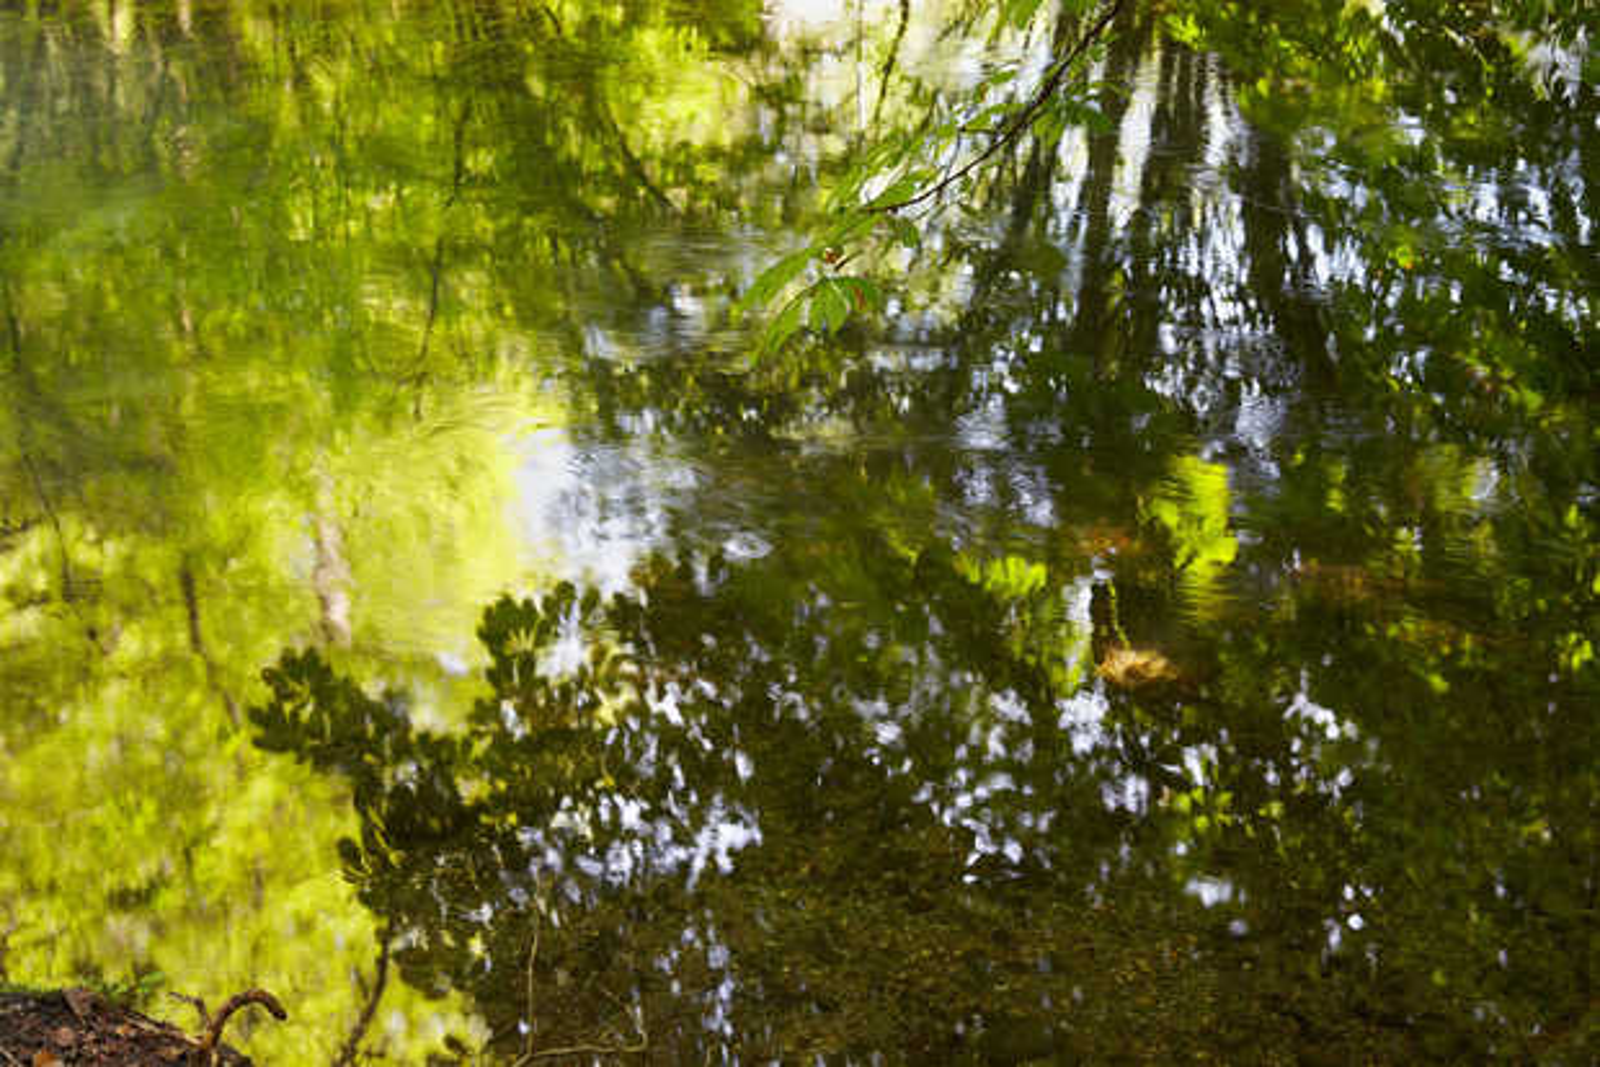 Enchanted Waters II - Juraj Lipscher